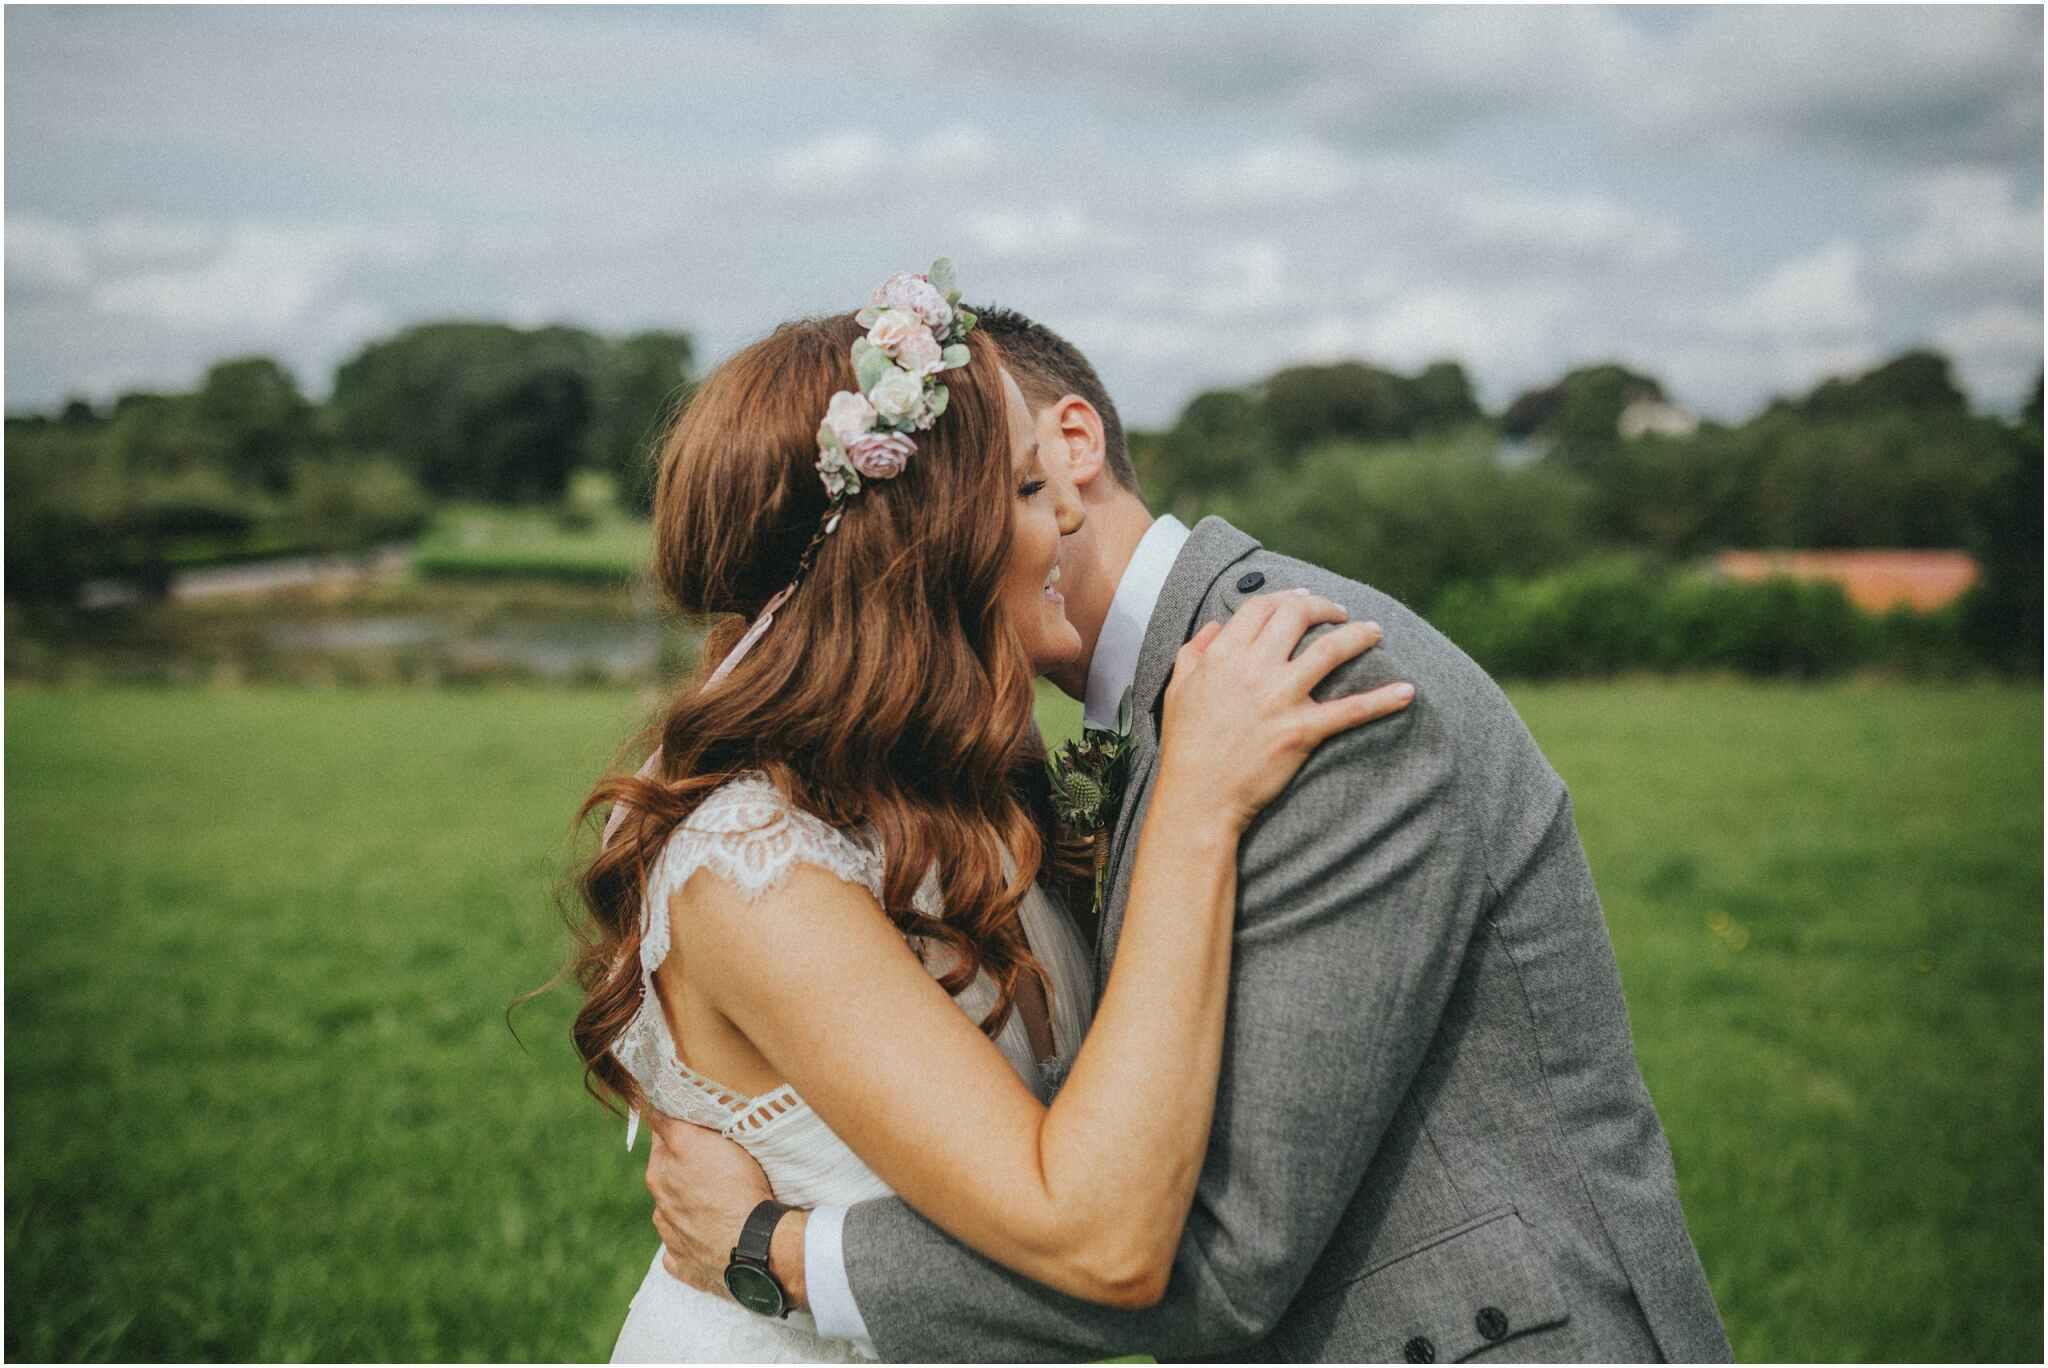 Fionnuala + Paul - Mount Druid Alternative Wedding 128